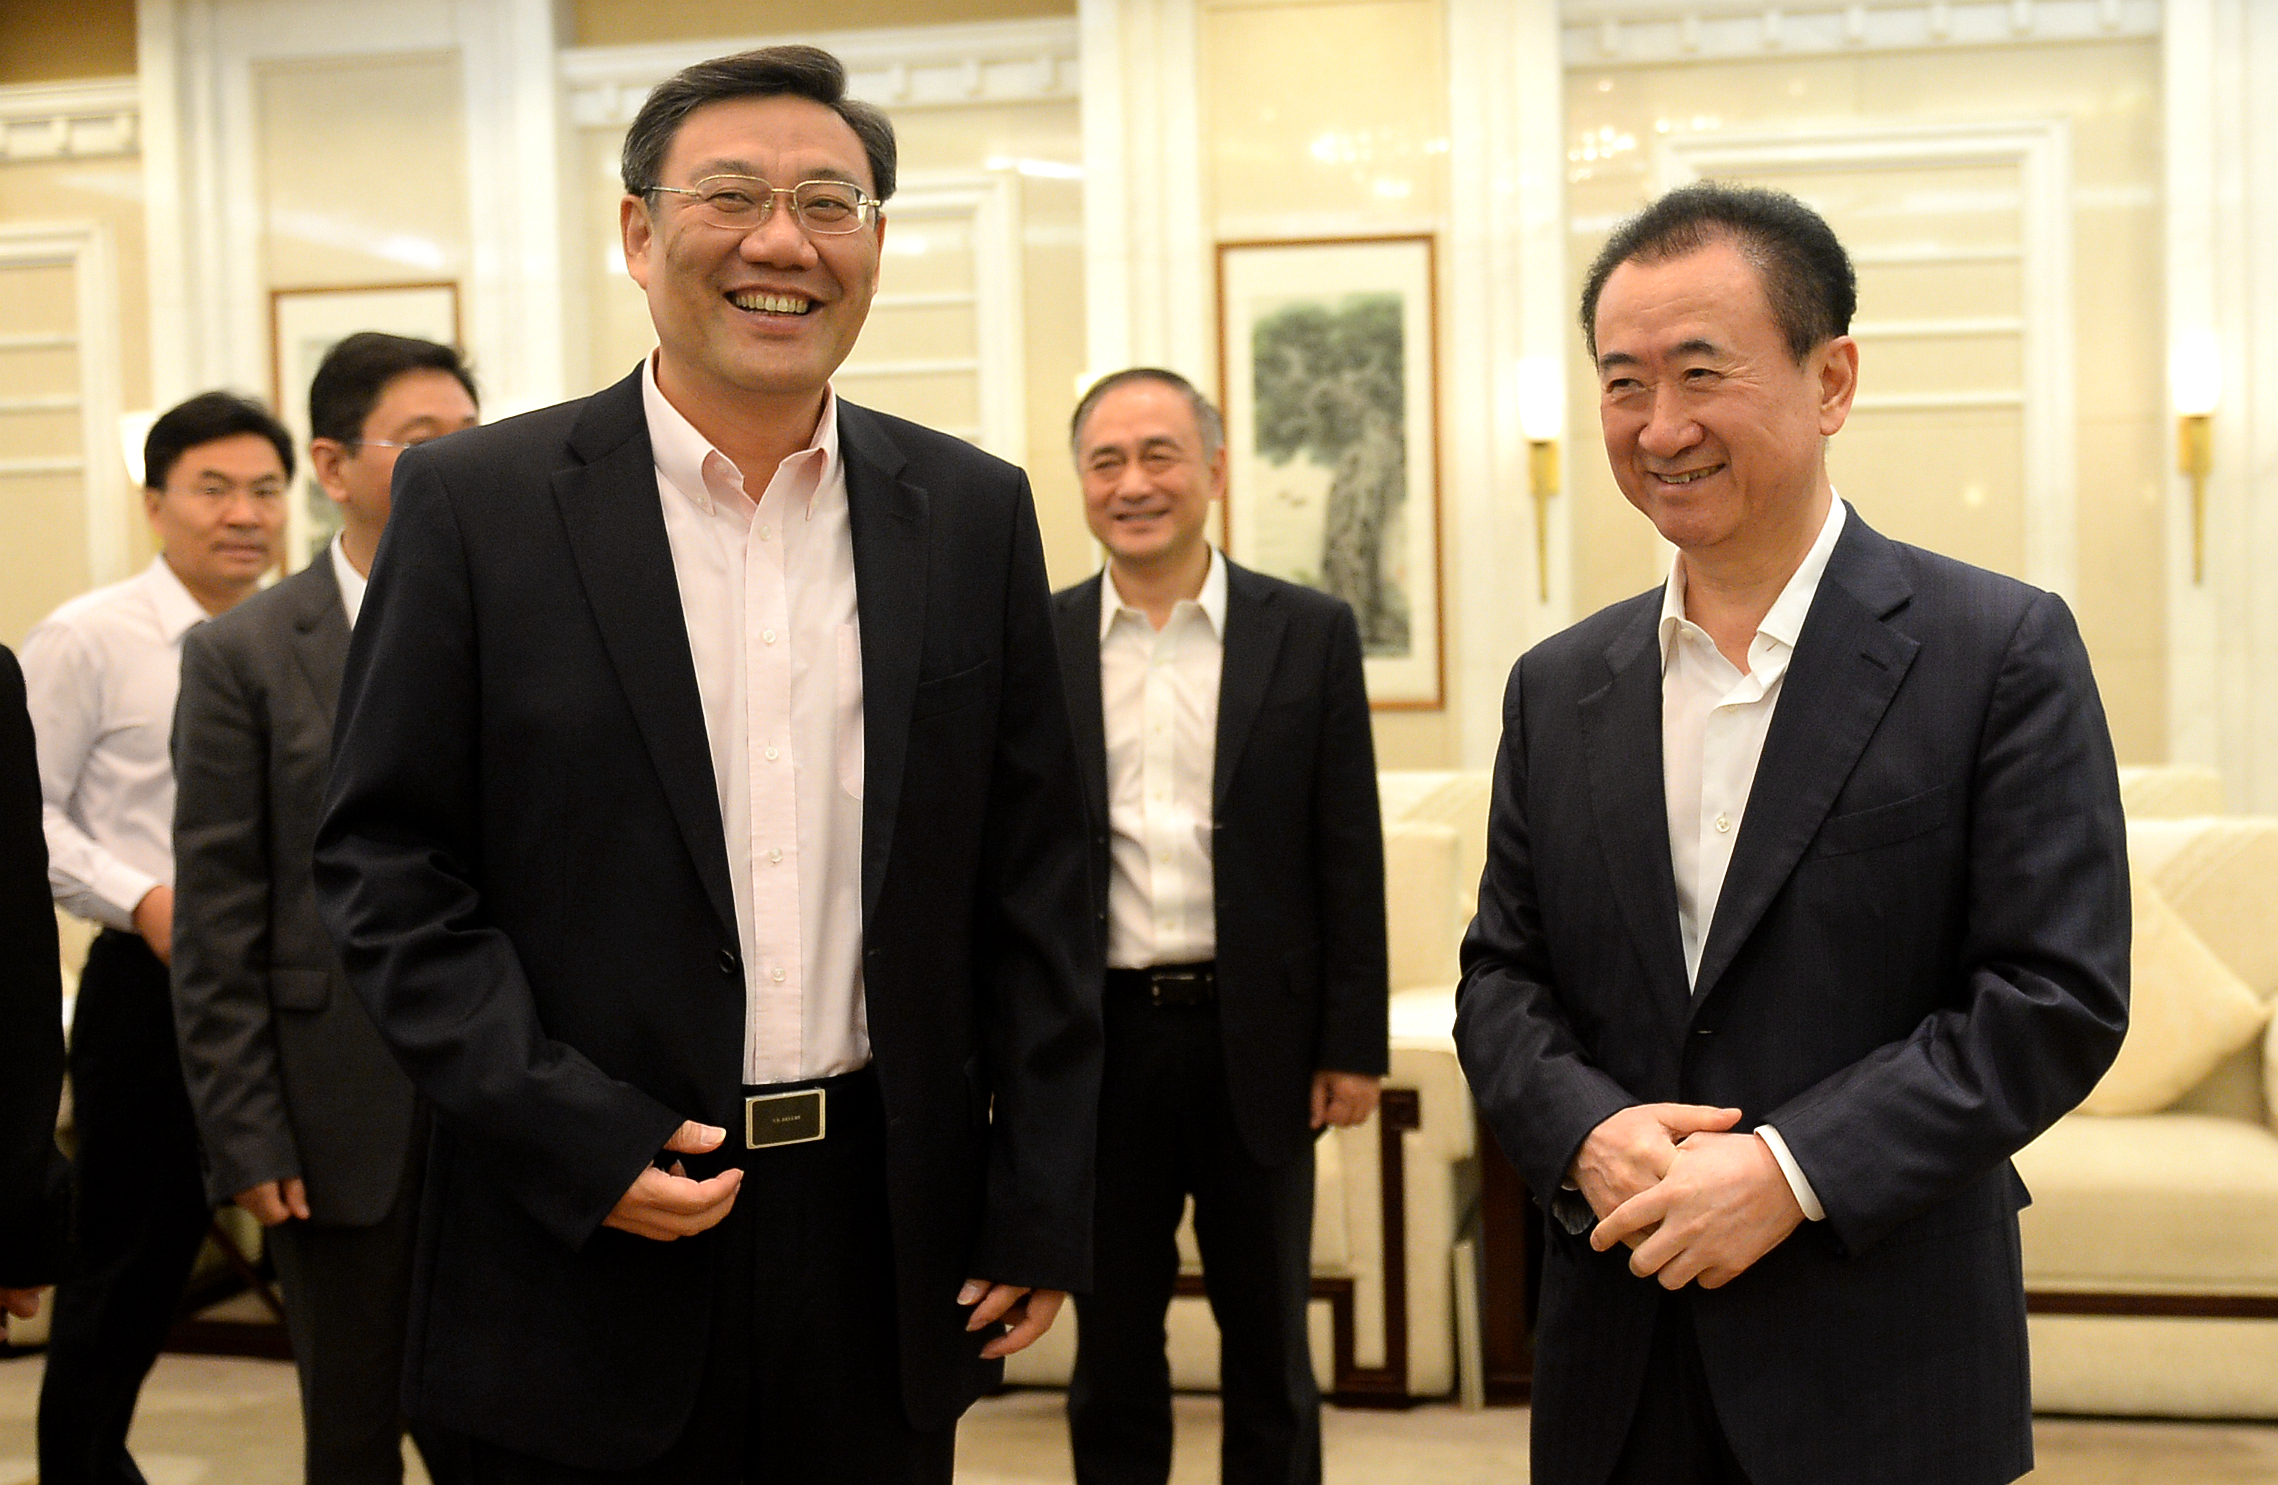 Wanda Group Will Invest 60 Billion Yuan In Shandong